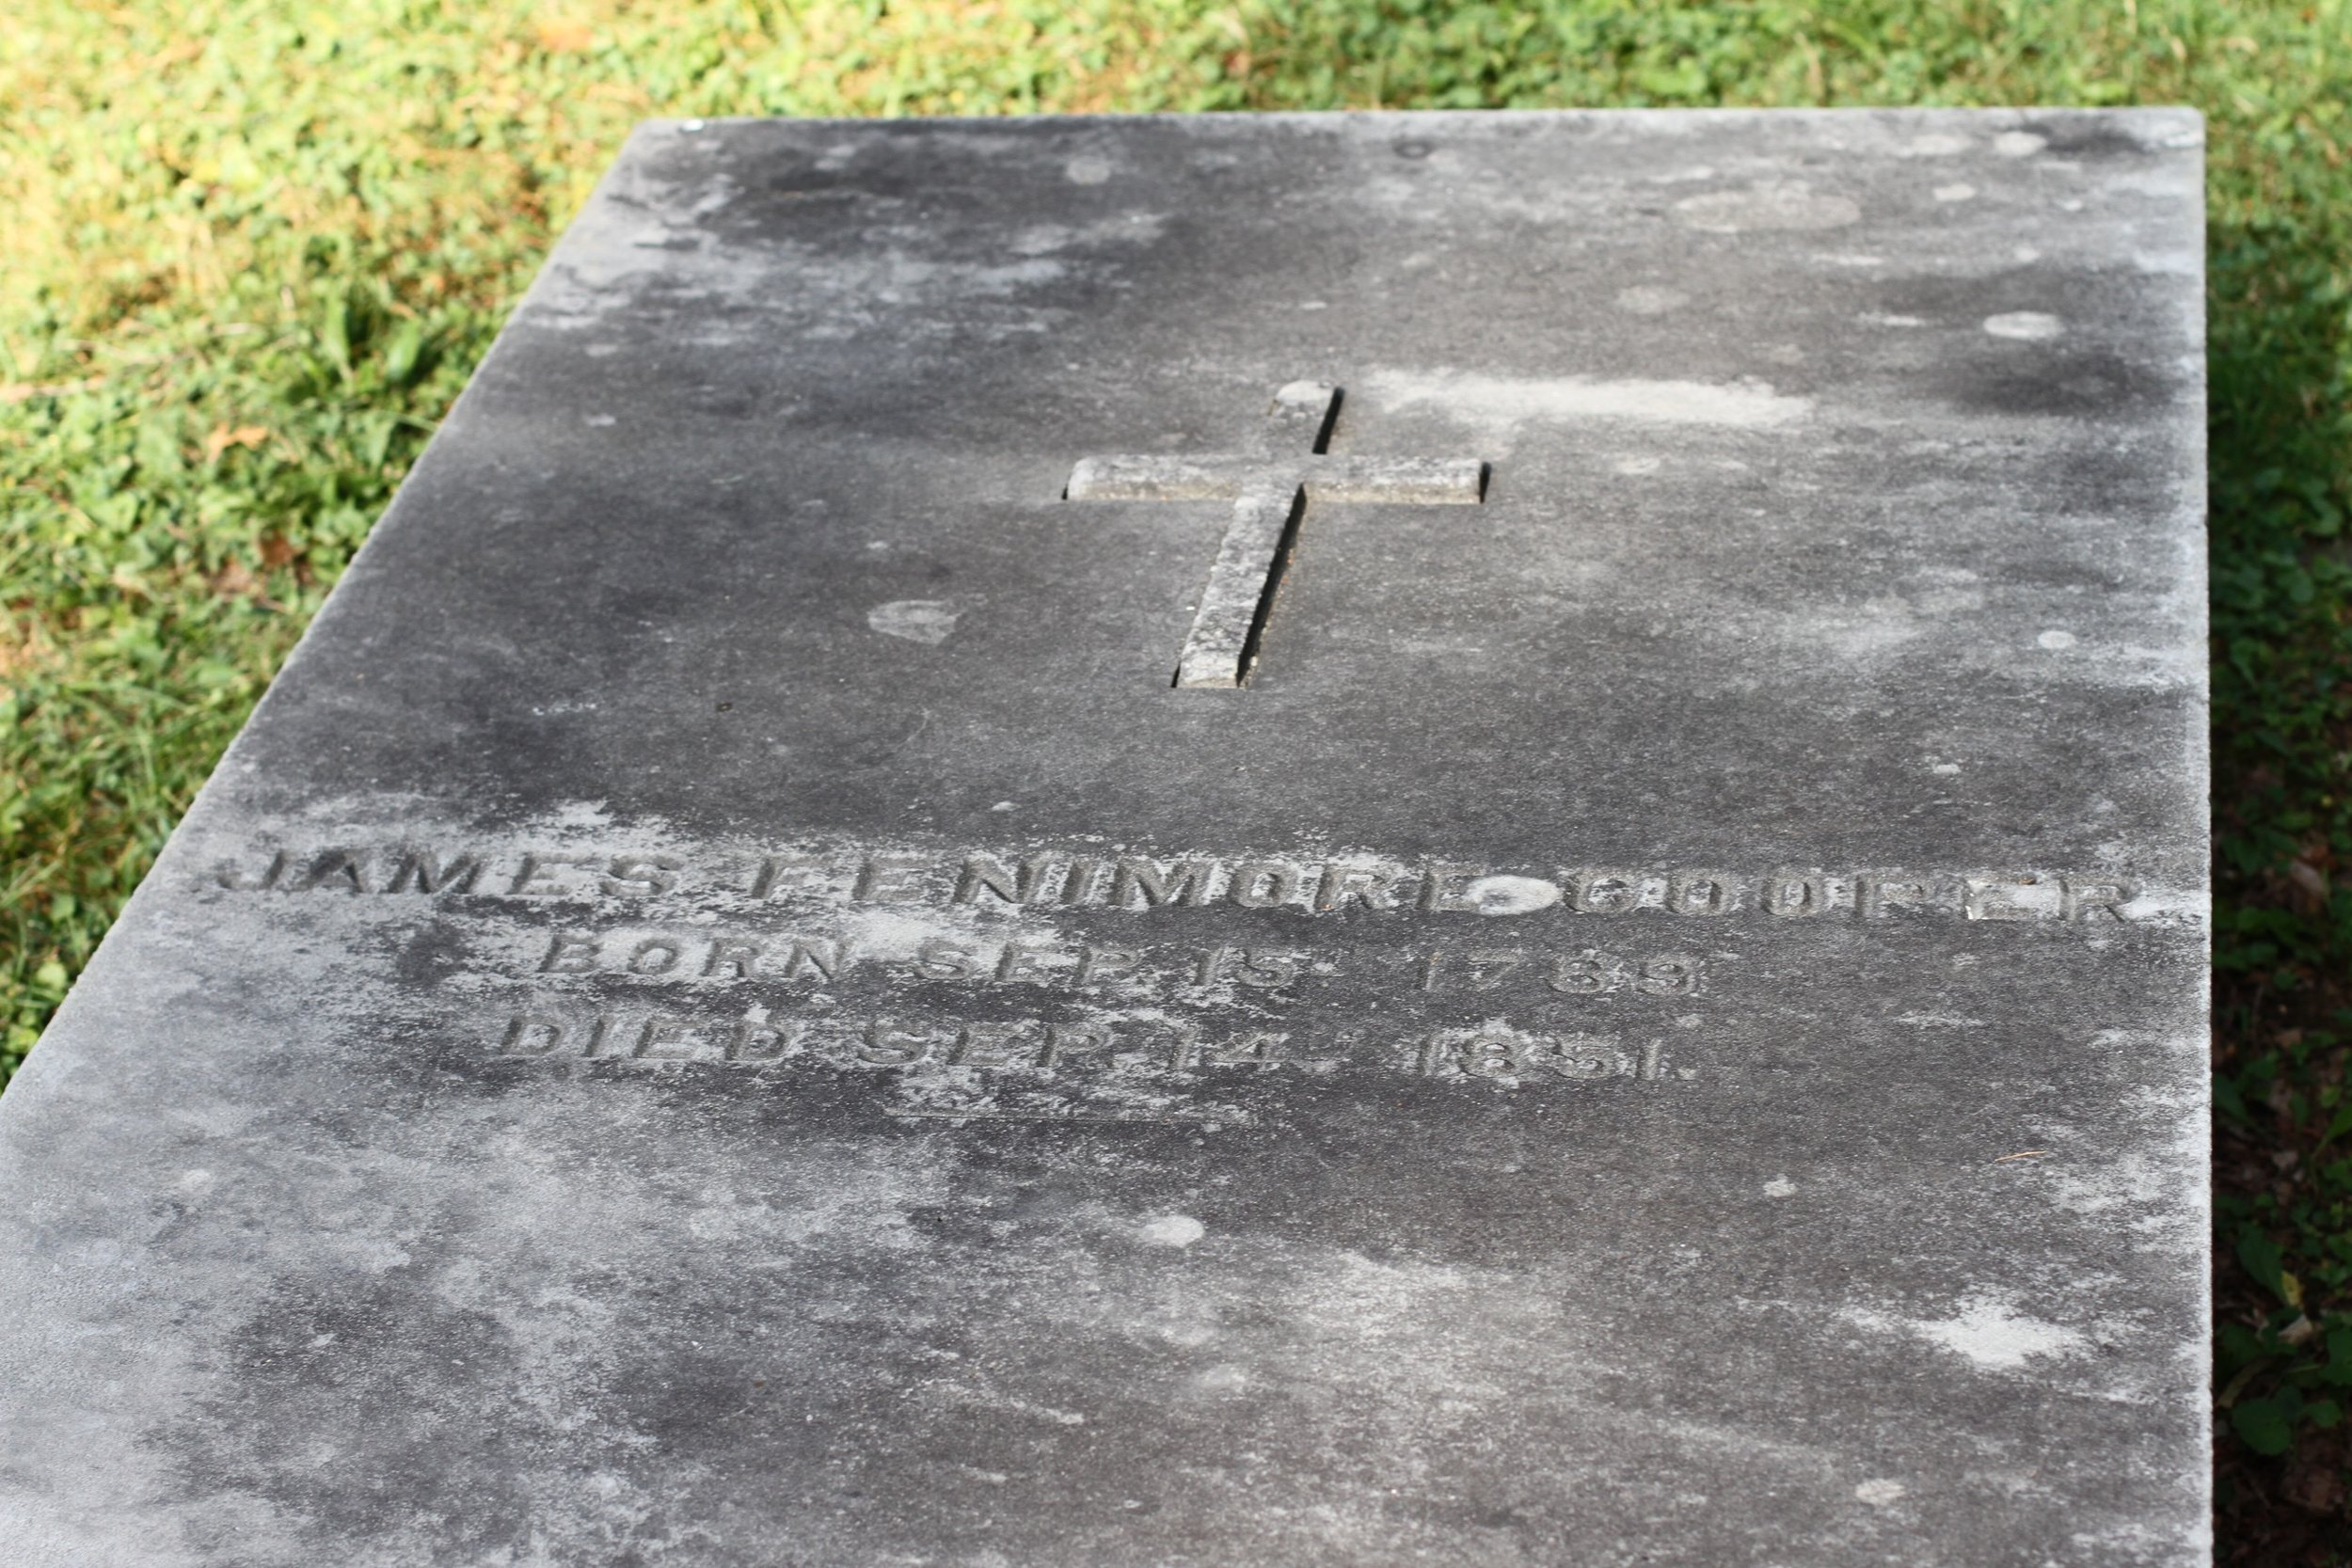 James Fenimore Cooper's grave.